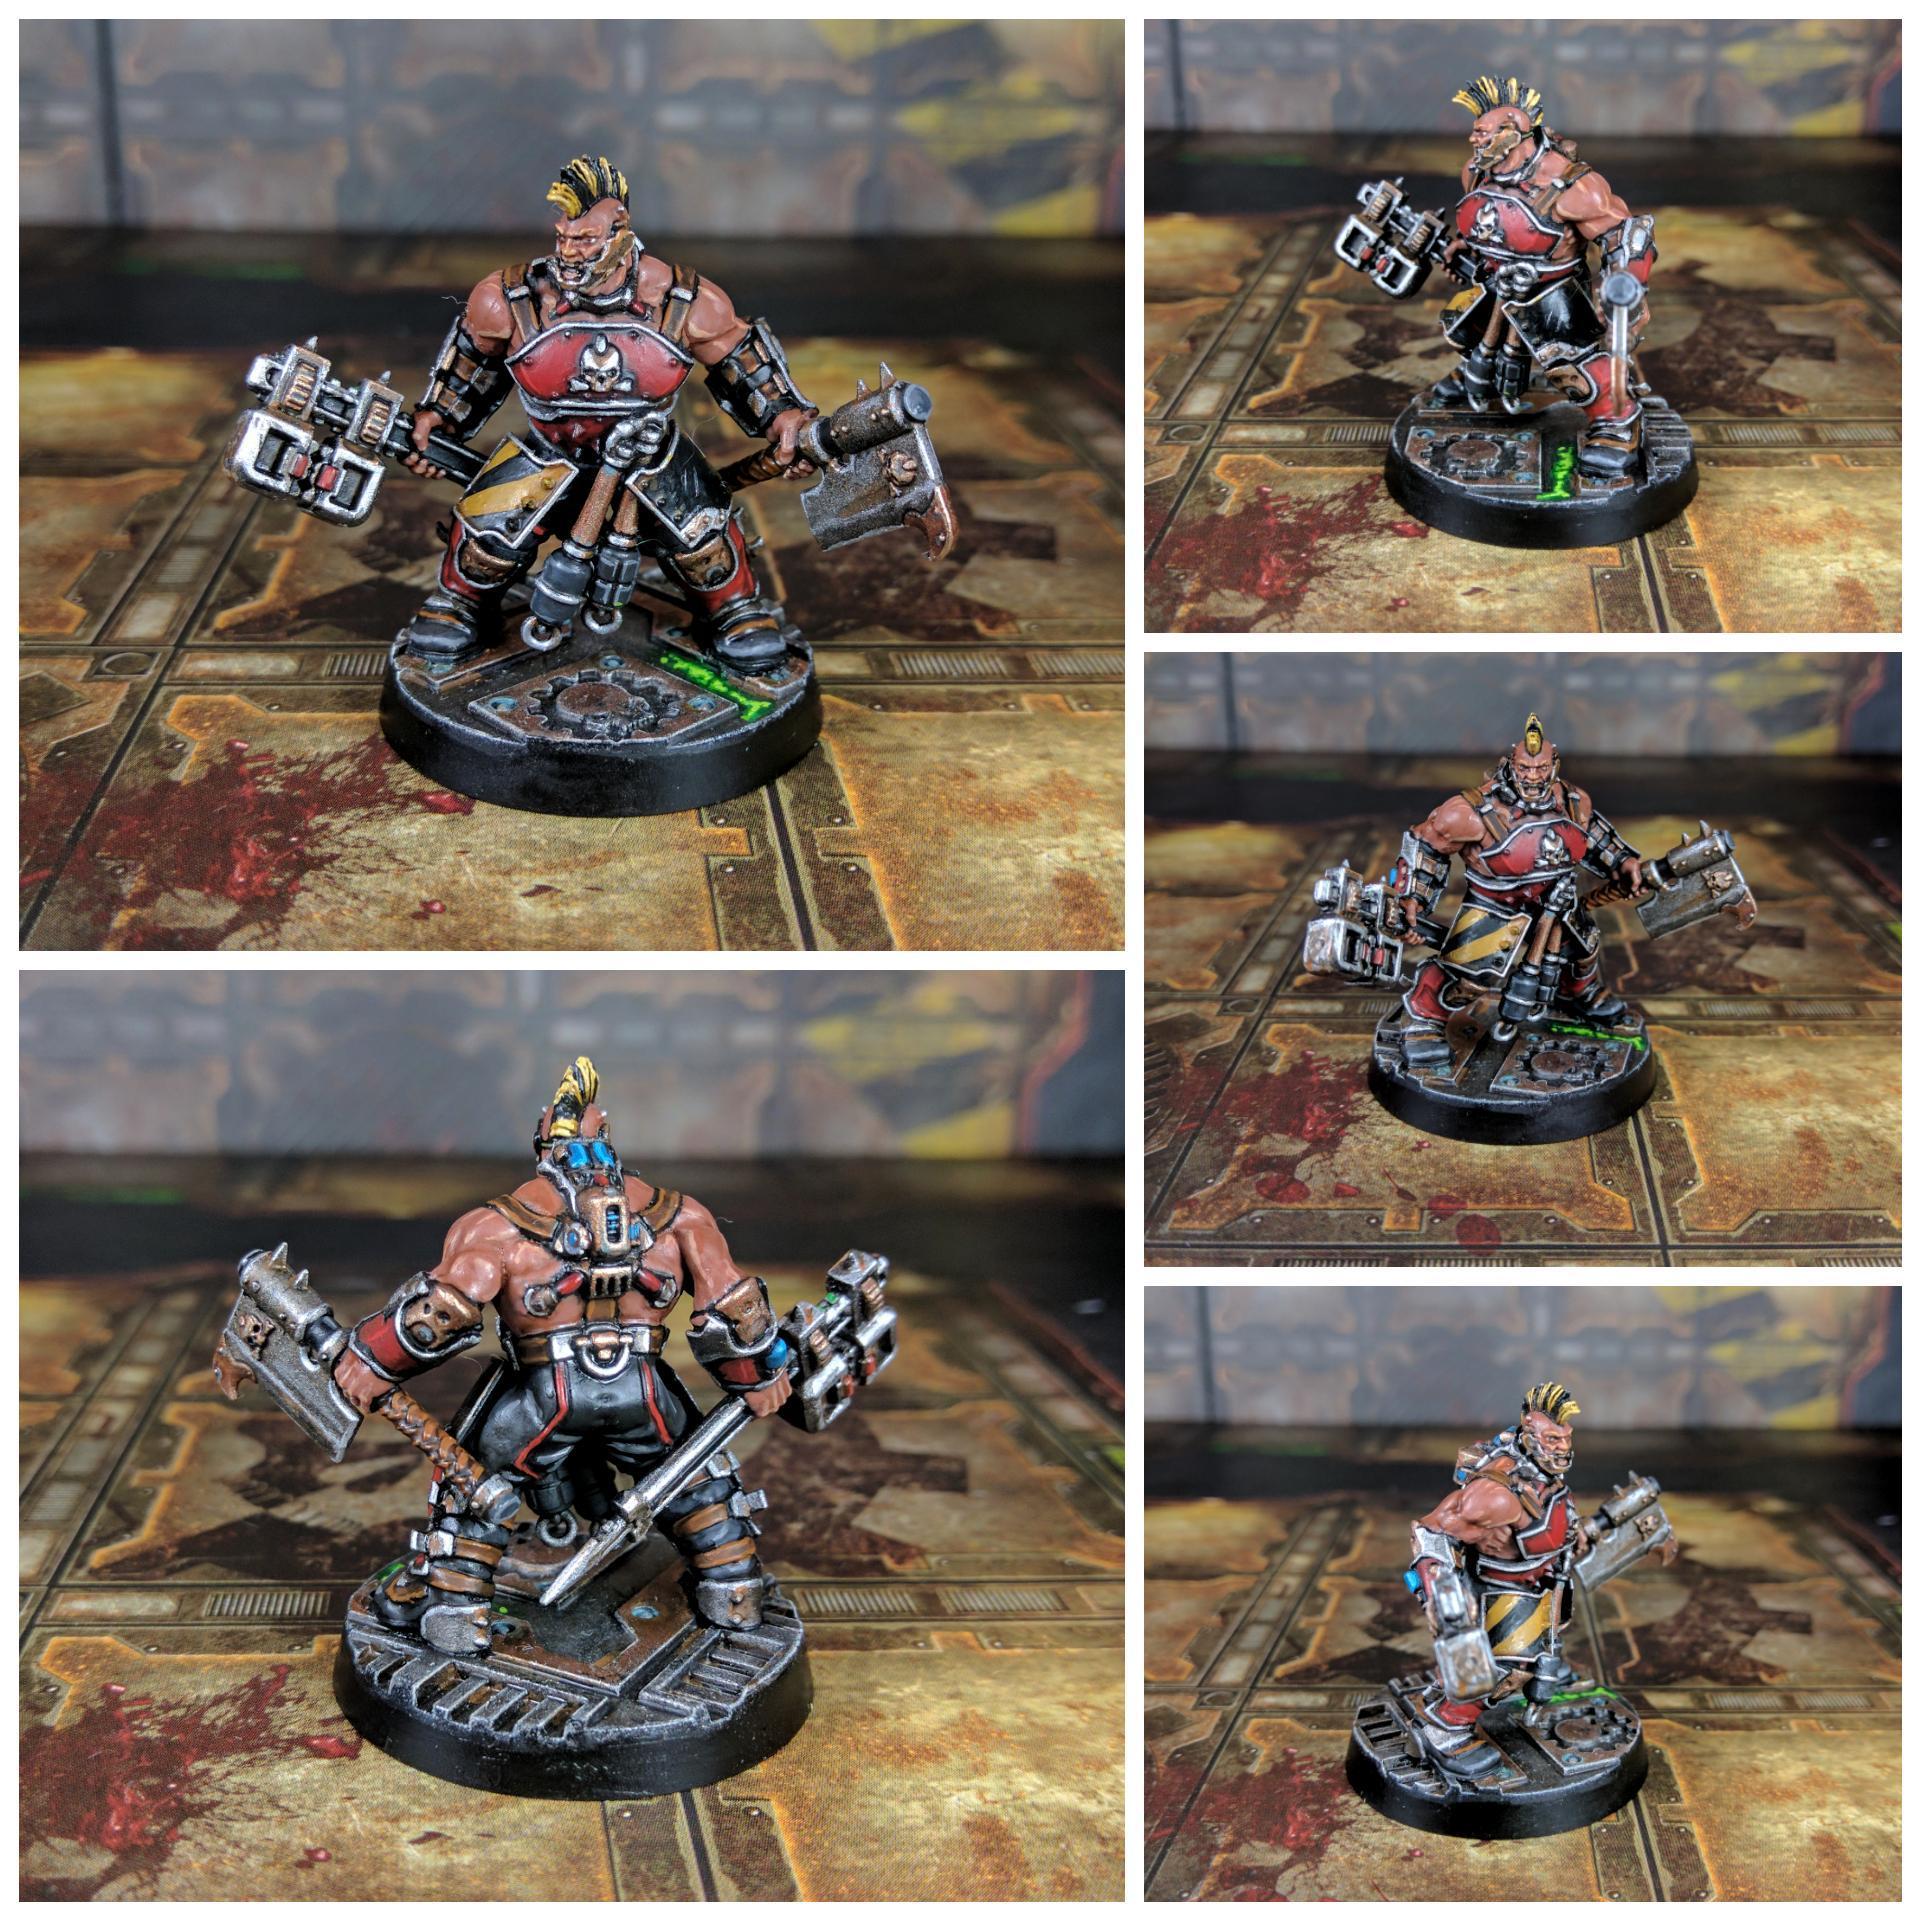 Brute Cleaver, House Goliath, Ironlords, Necromunda, Spud-jacker, Underhive